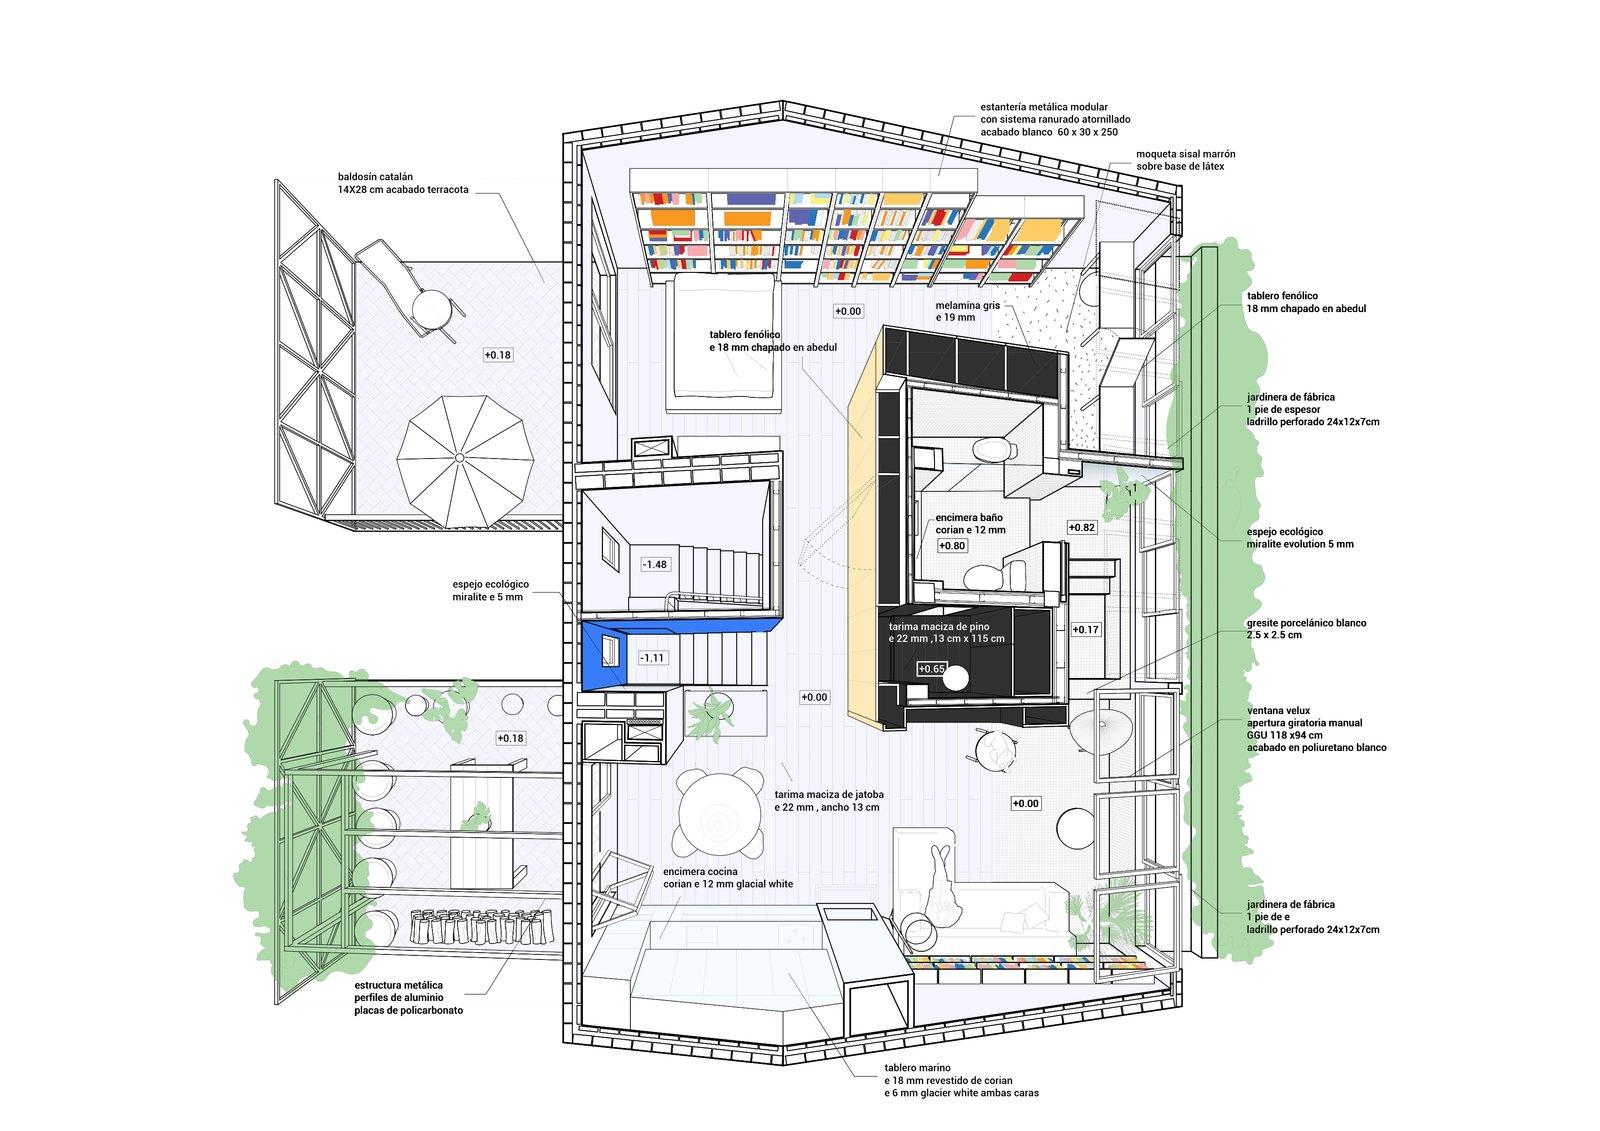 G House axonometric drawing